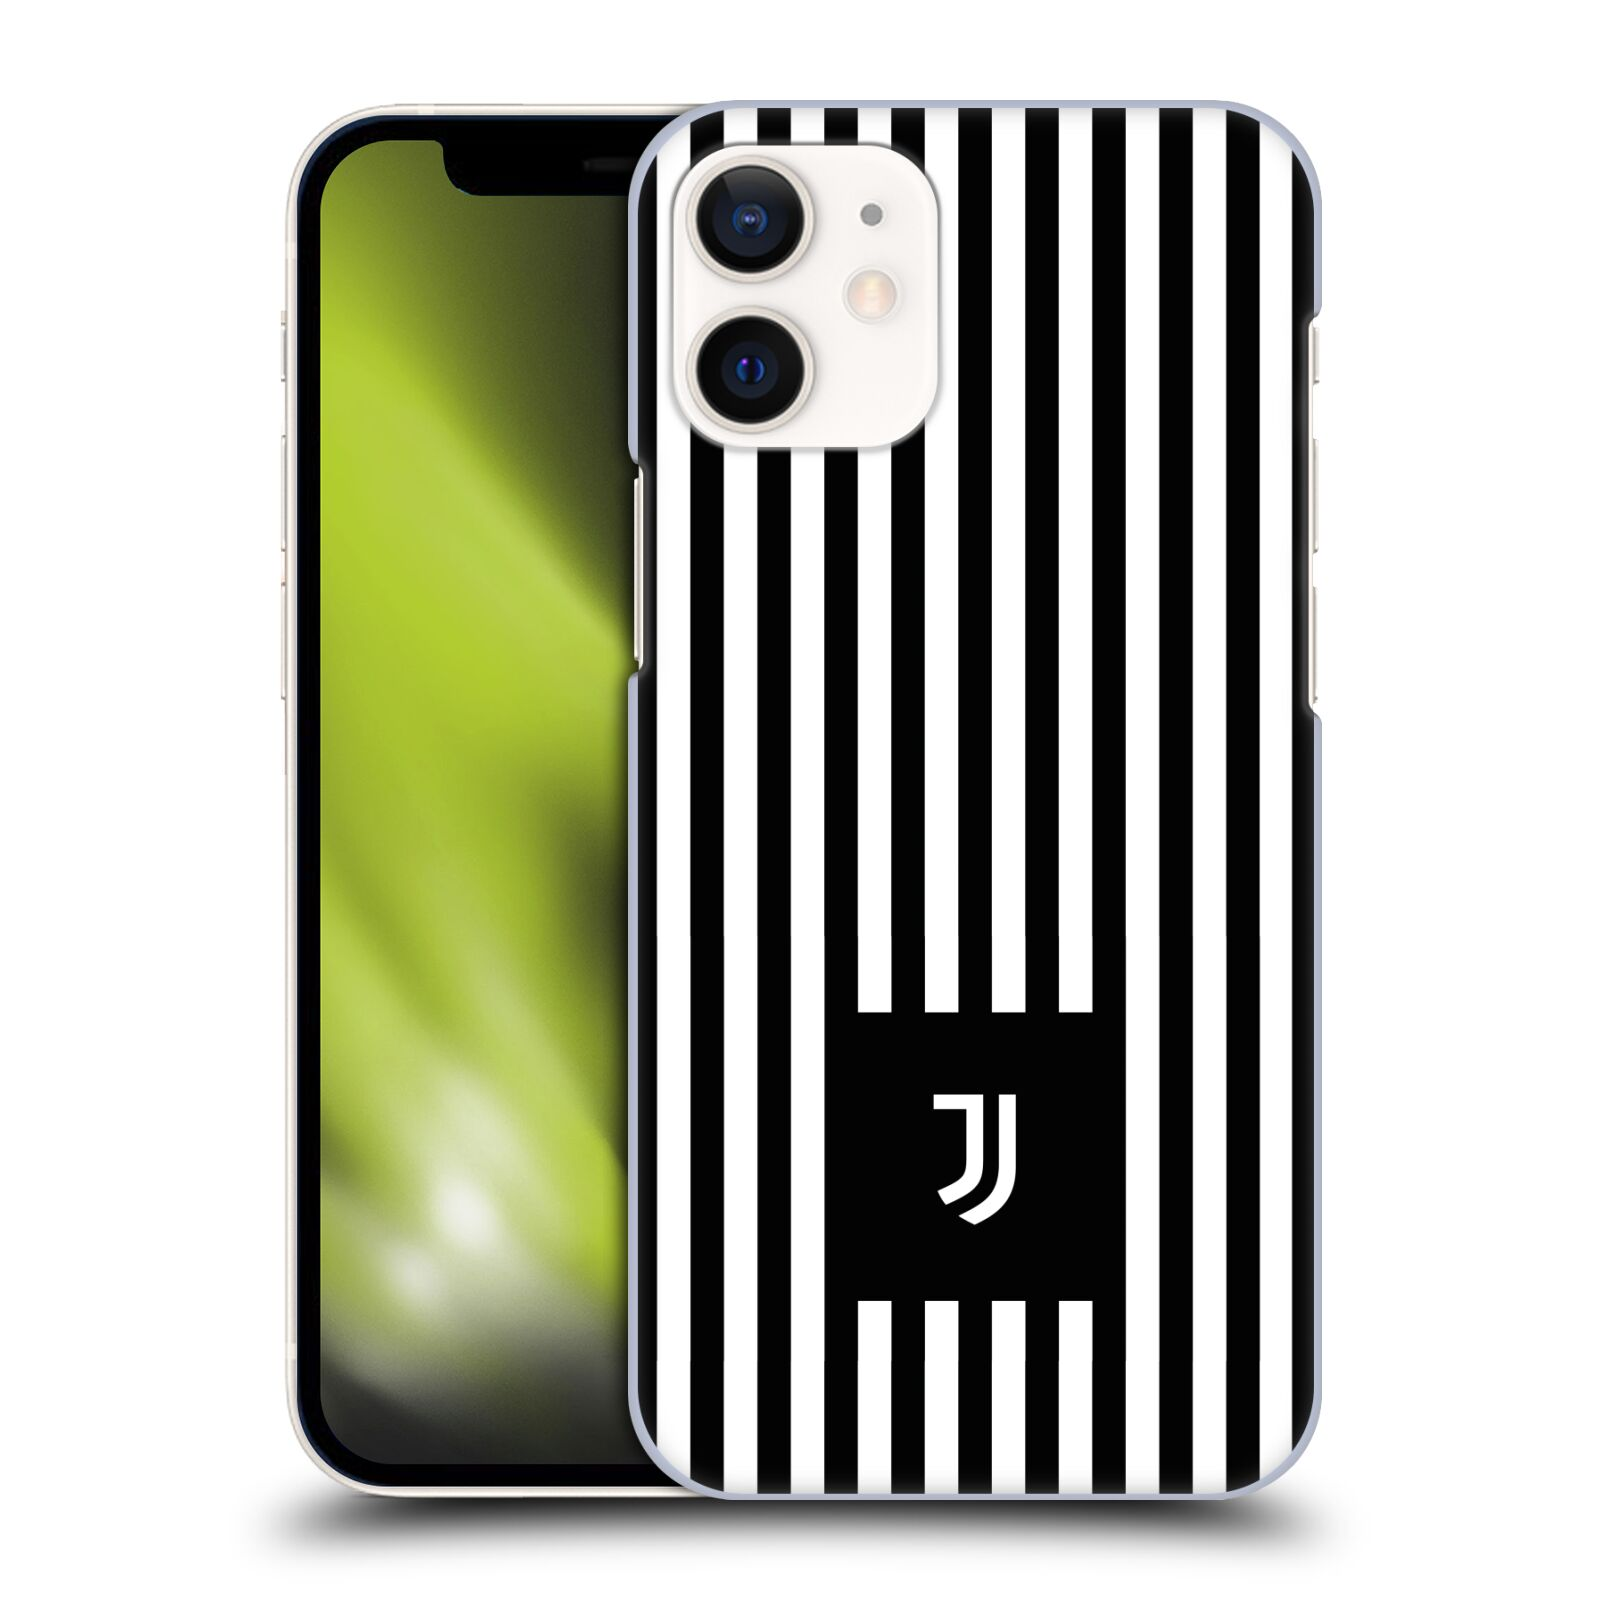 Plastové pouzdro na mobil Apple iPhone 12 Mini - Head Case - Juventus FC - Nové logo - Pruhy